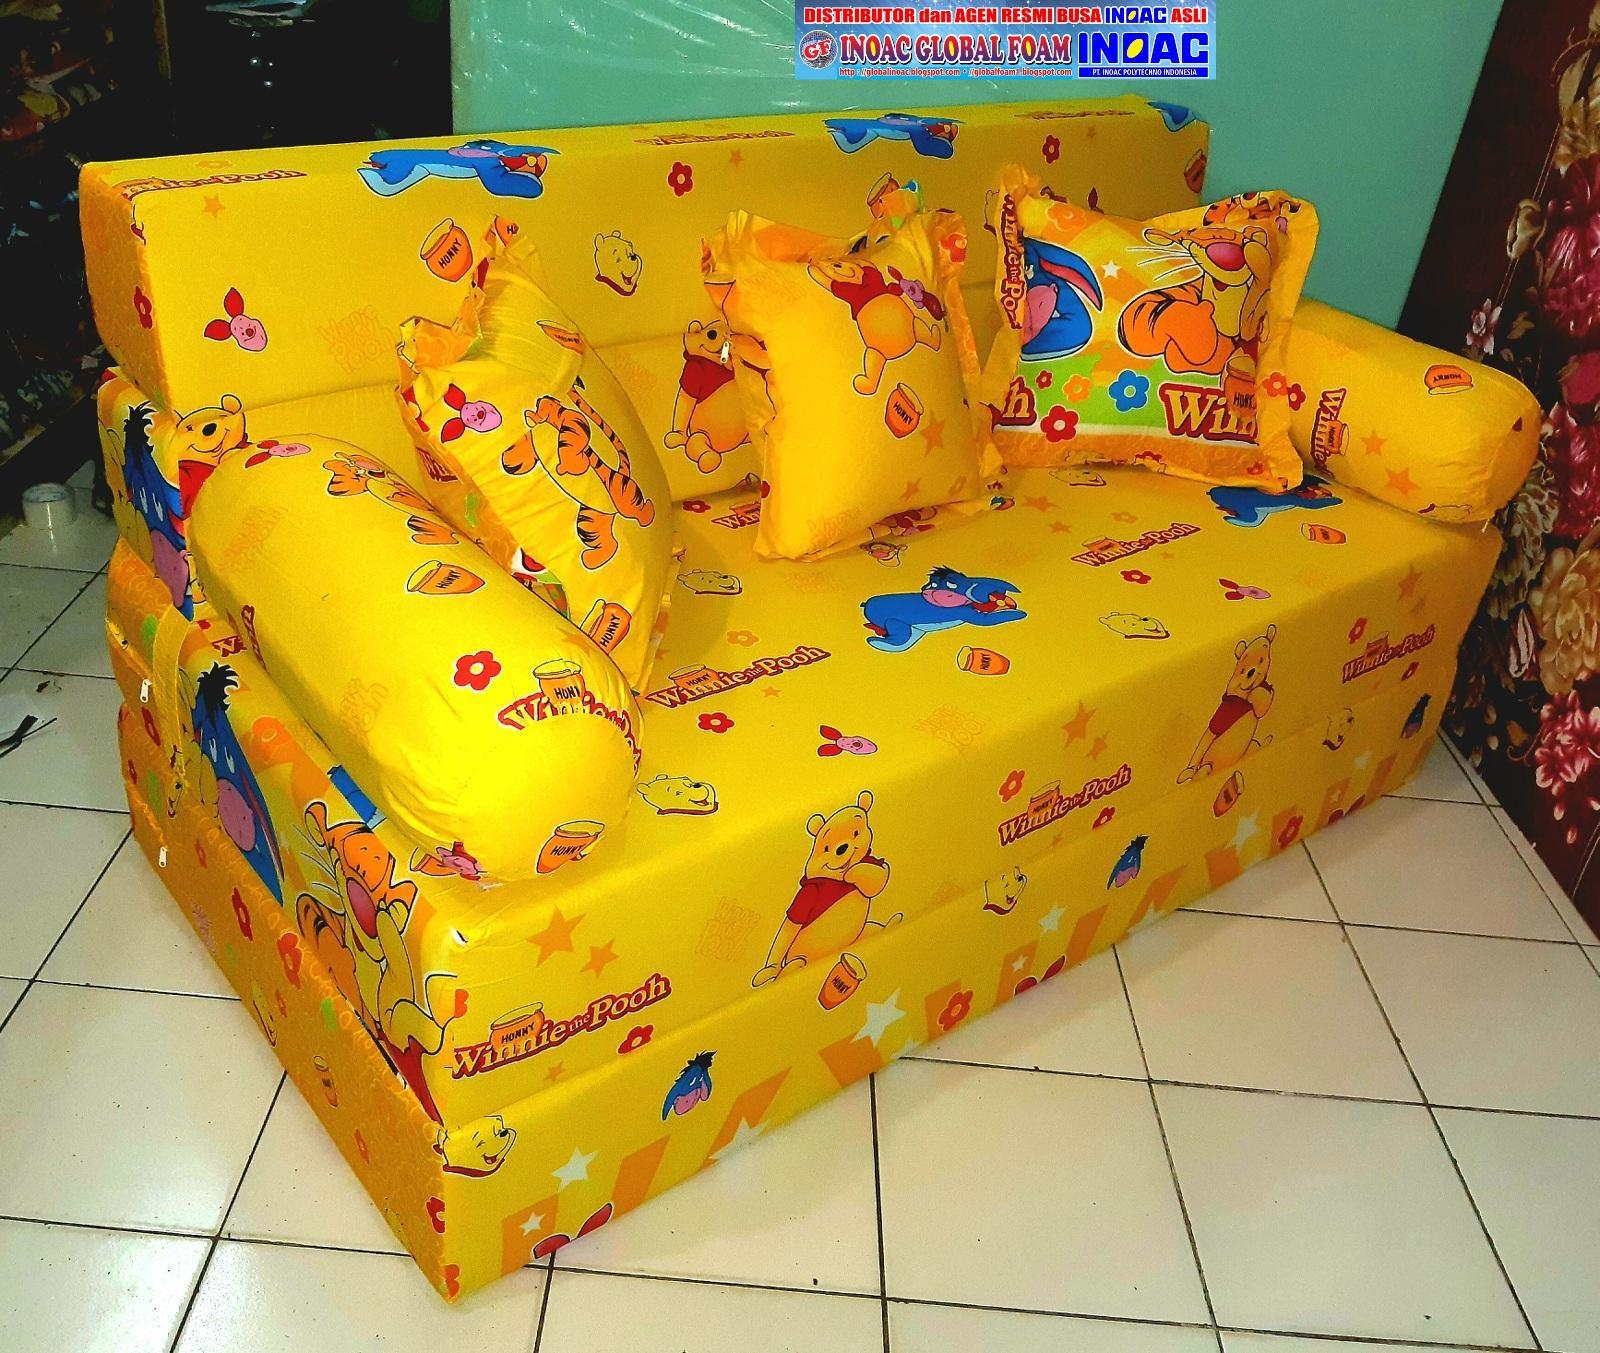 Harga Sofa Bed Inoac No 1 Mirror Table Kasur 2018 Distributor Busa Asli Global